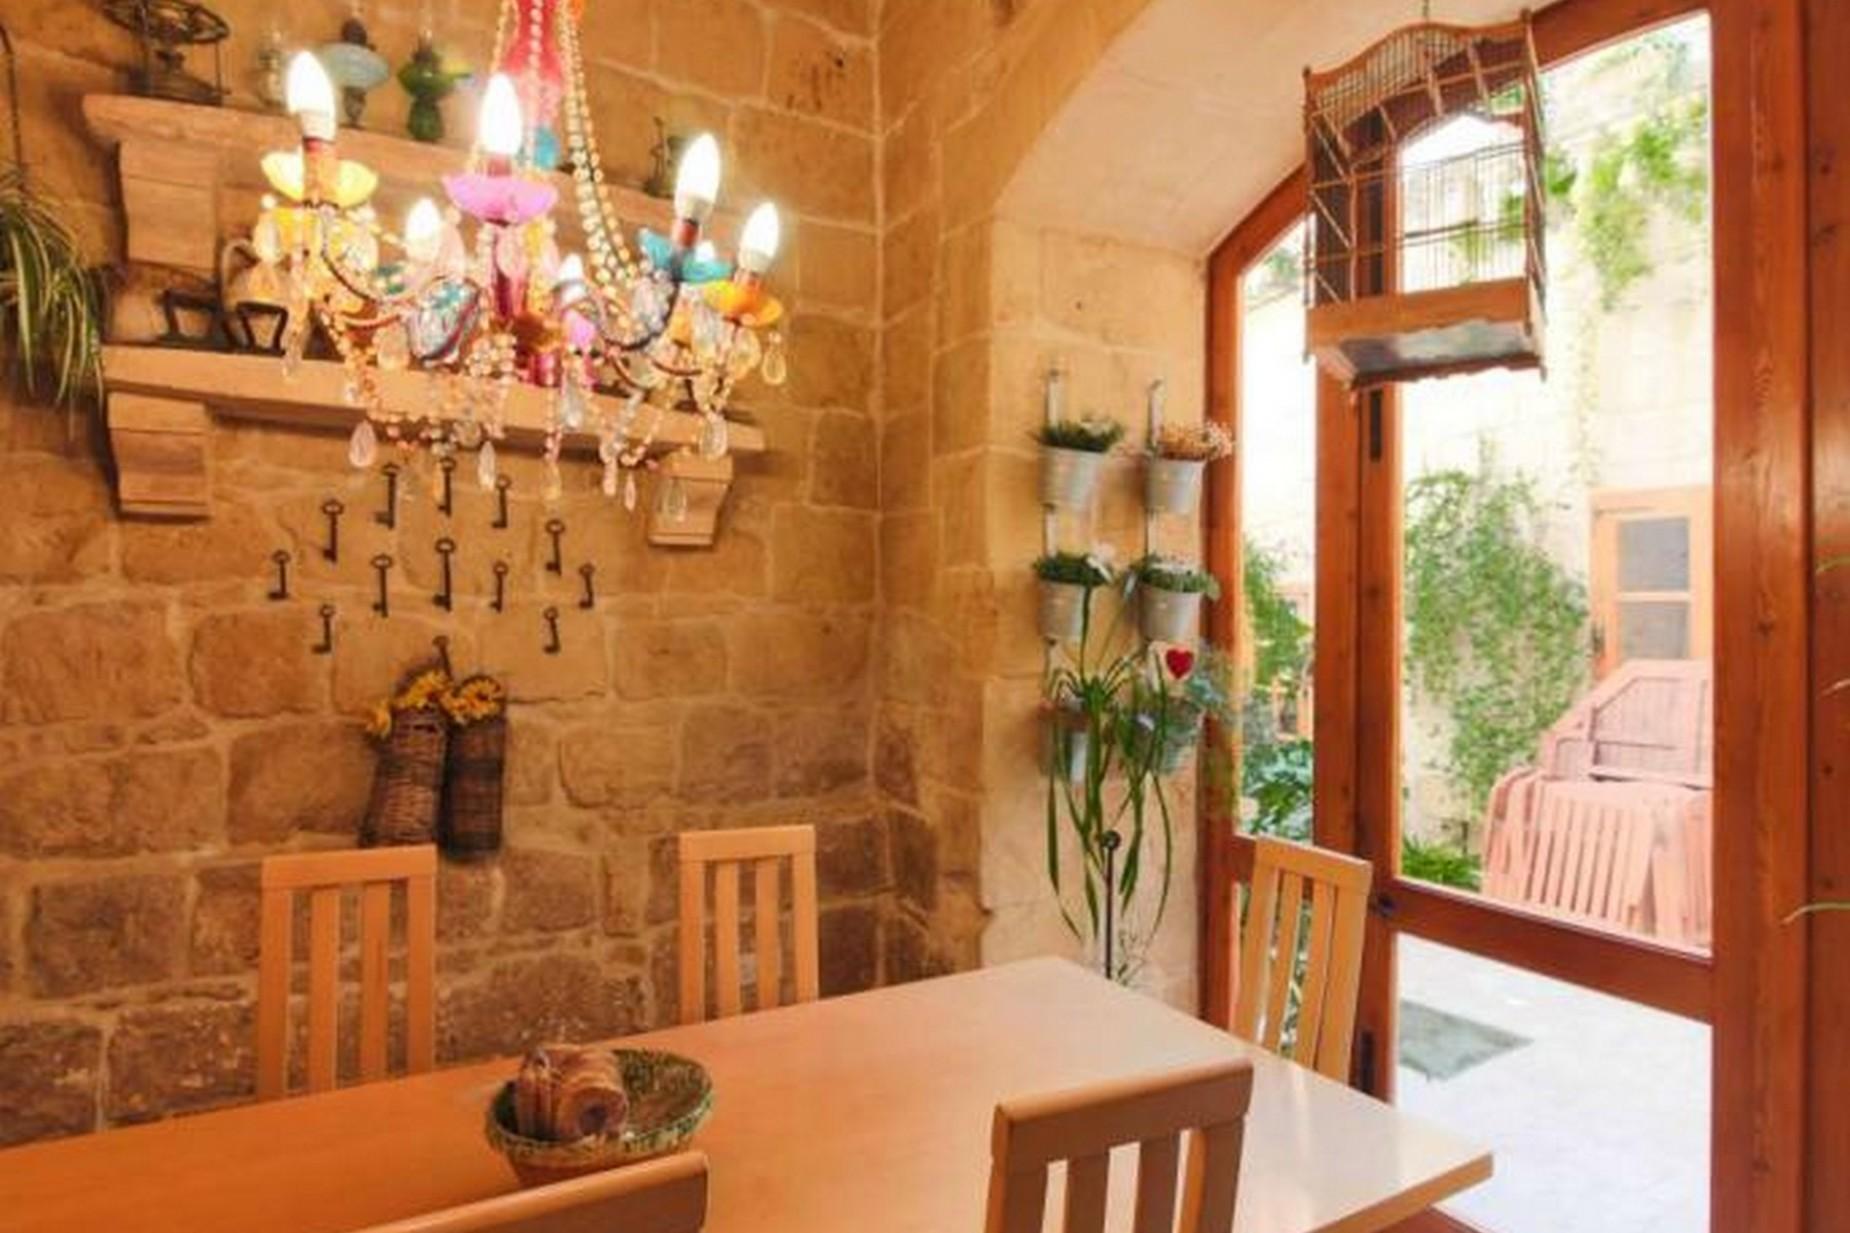 4 bed House of Character For Rent in Birkirkara, Birkirkara - thumb 3